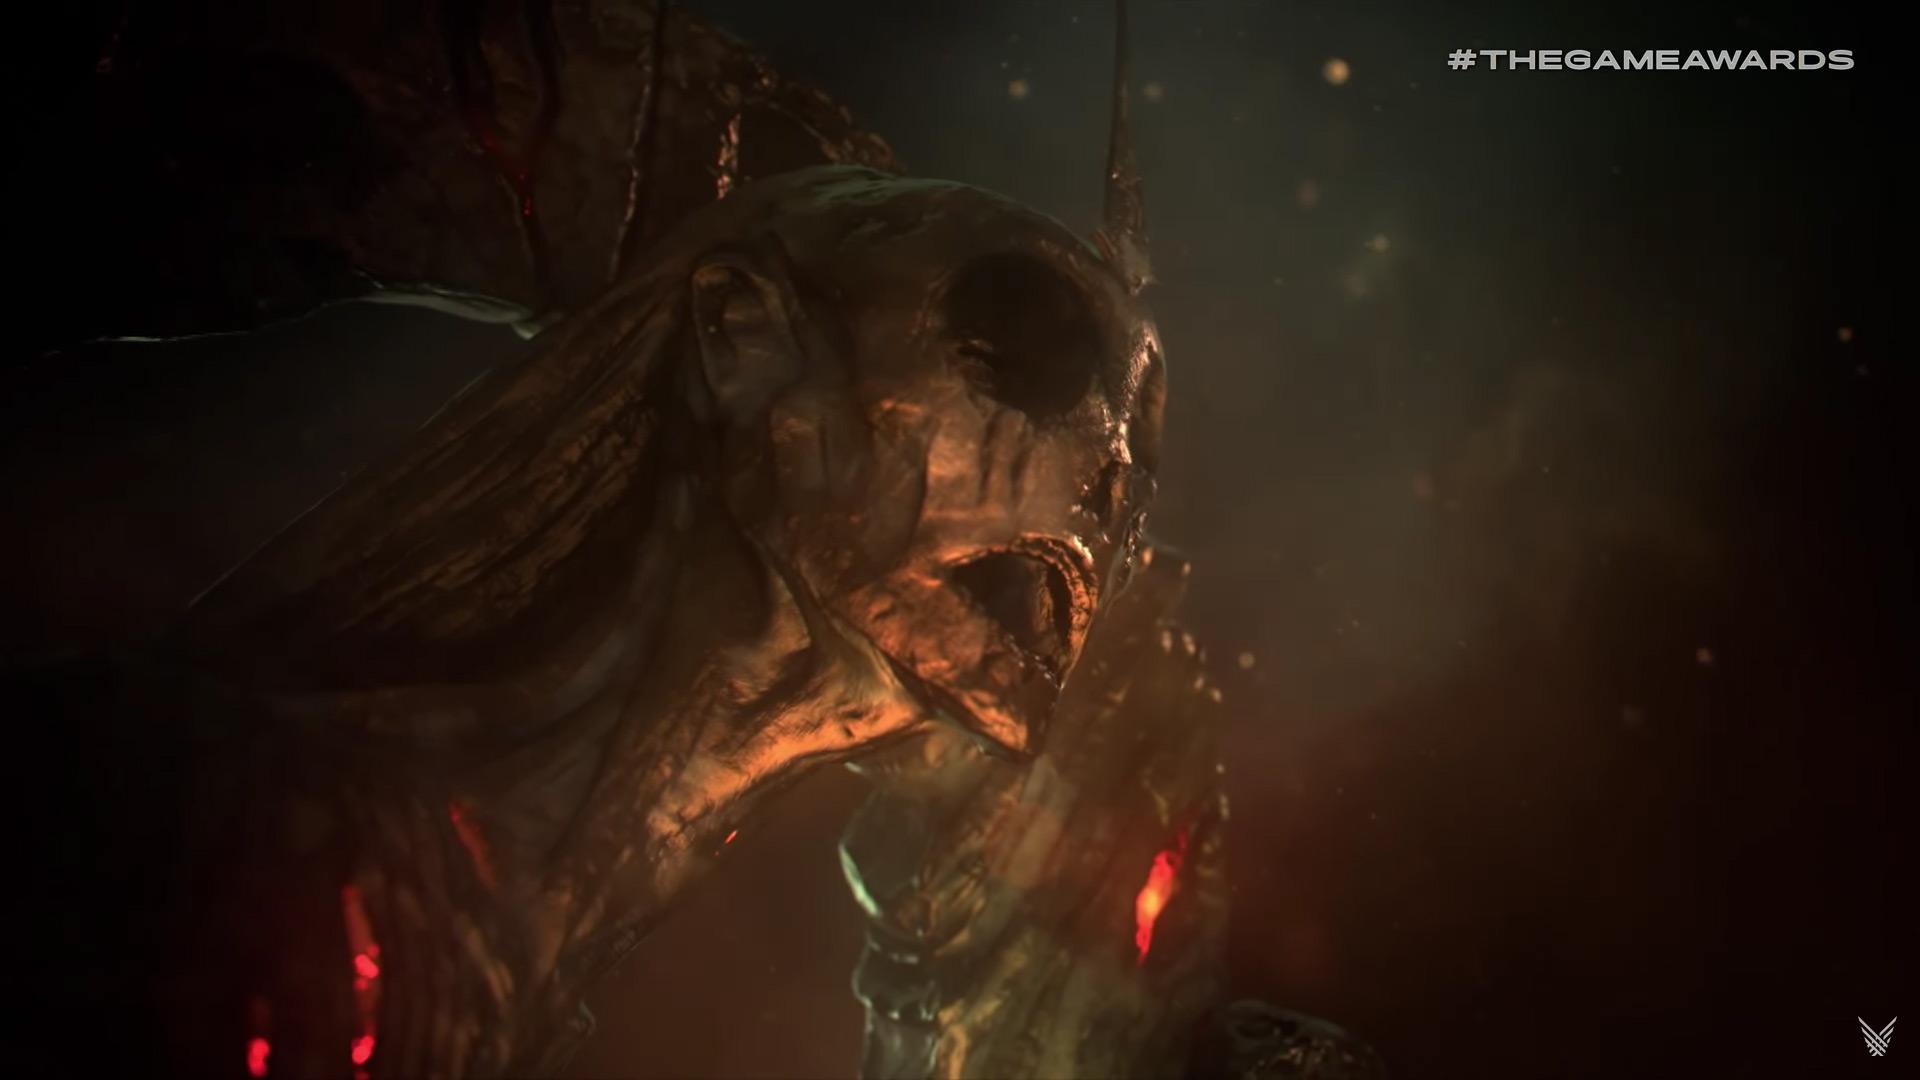 BioWare made an obligatory Dragon Age 4 teaser screenshot